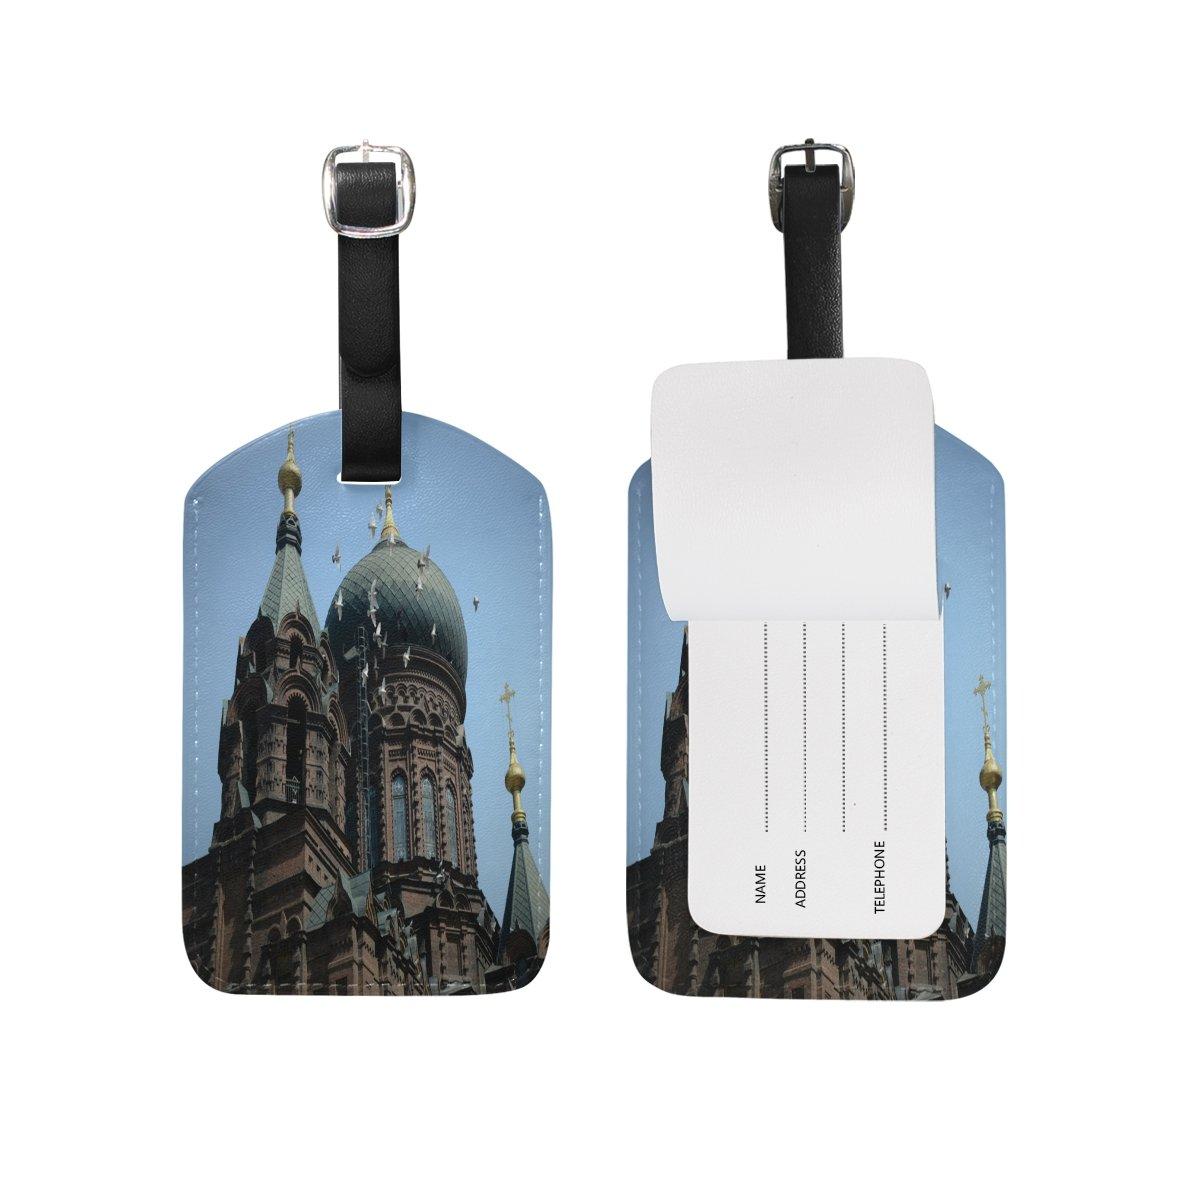 Saobao Travel Luggage Tag Night Castle PU Leather Baggage Suitcase Travel ID Bag Tag 1Pcs